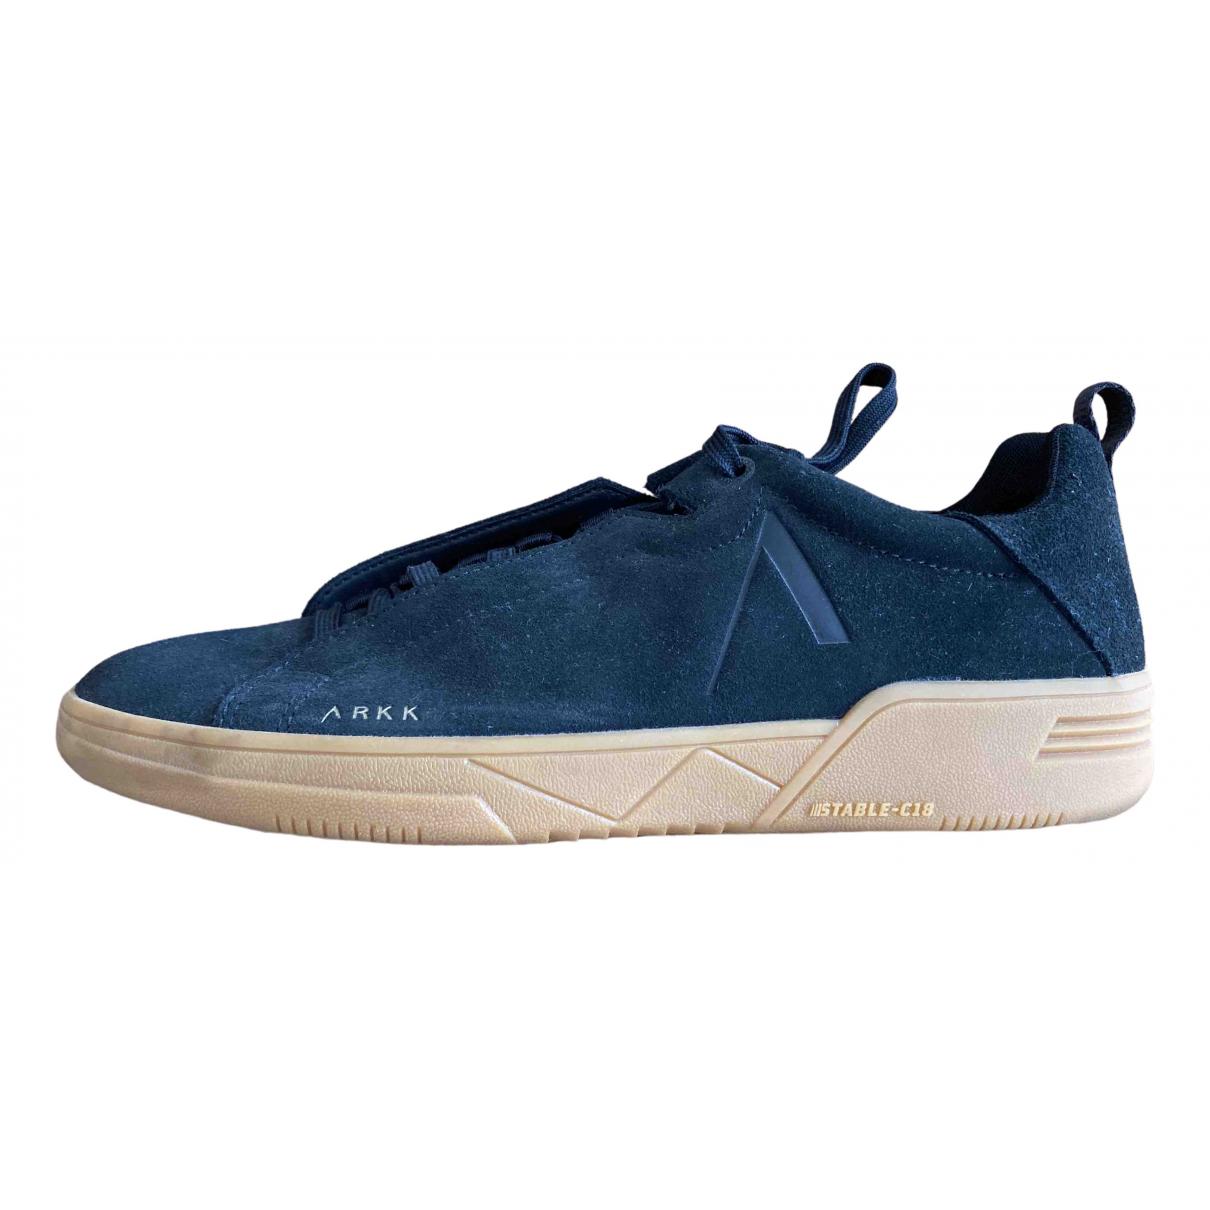 Arkk \N Sneakers in  Schwarz Veloursleder